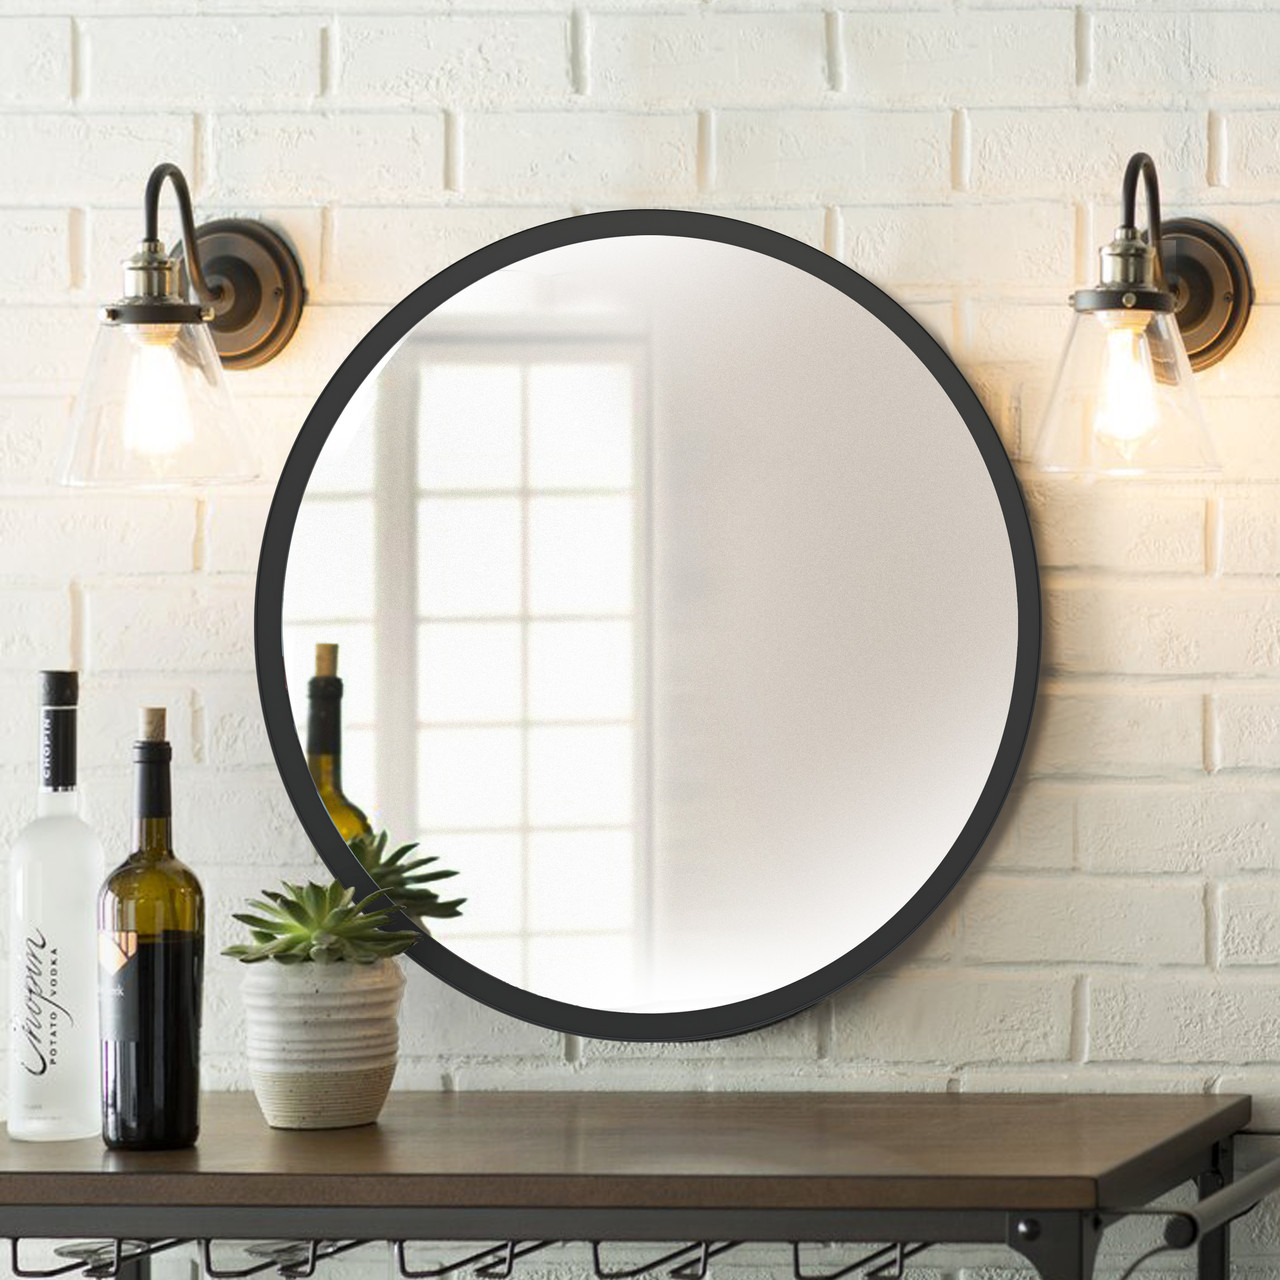 Зеркало 800мм белое Черный   Дзеркало 800мм біле Чорний